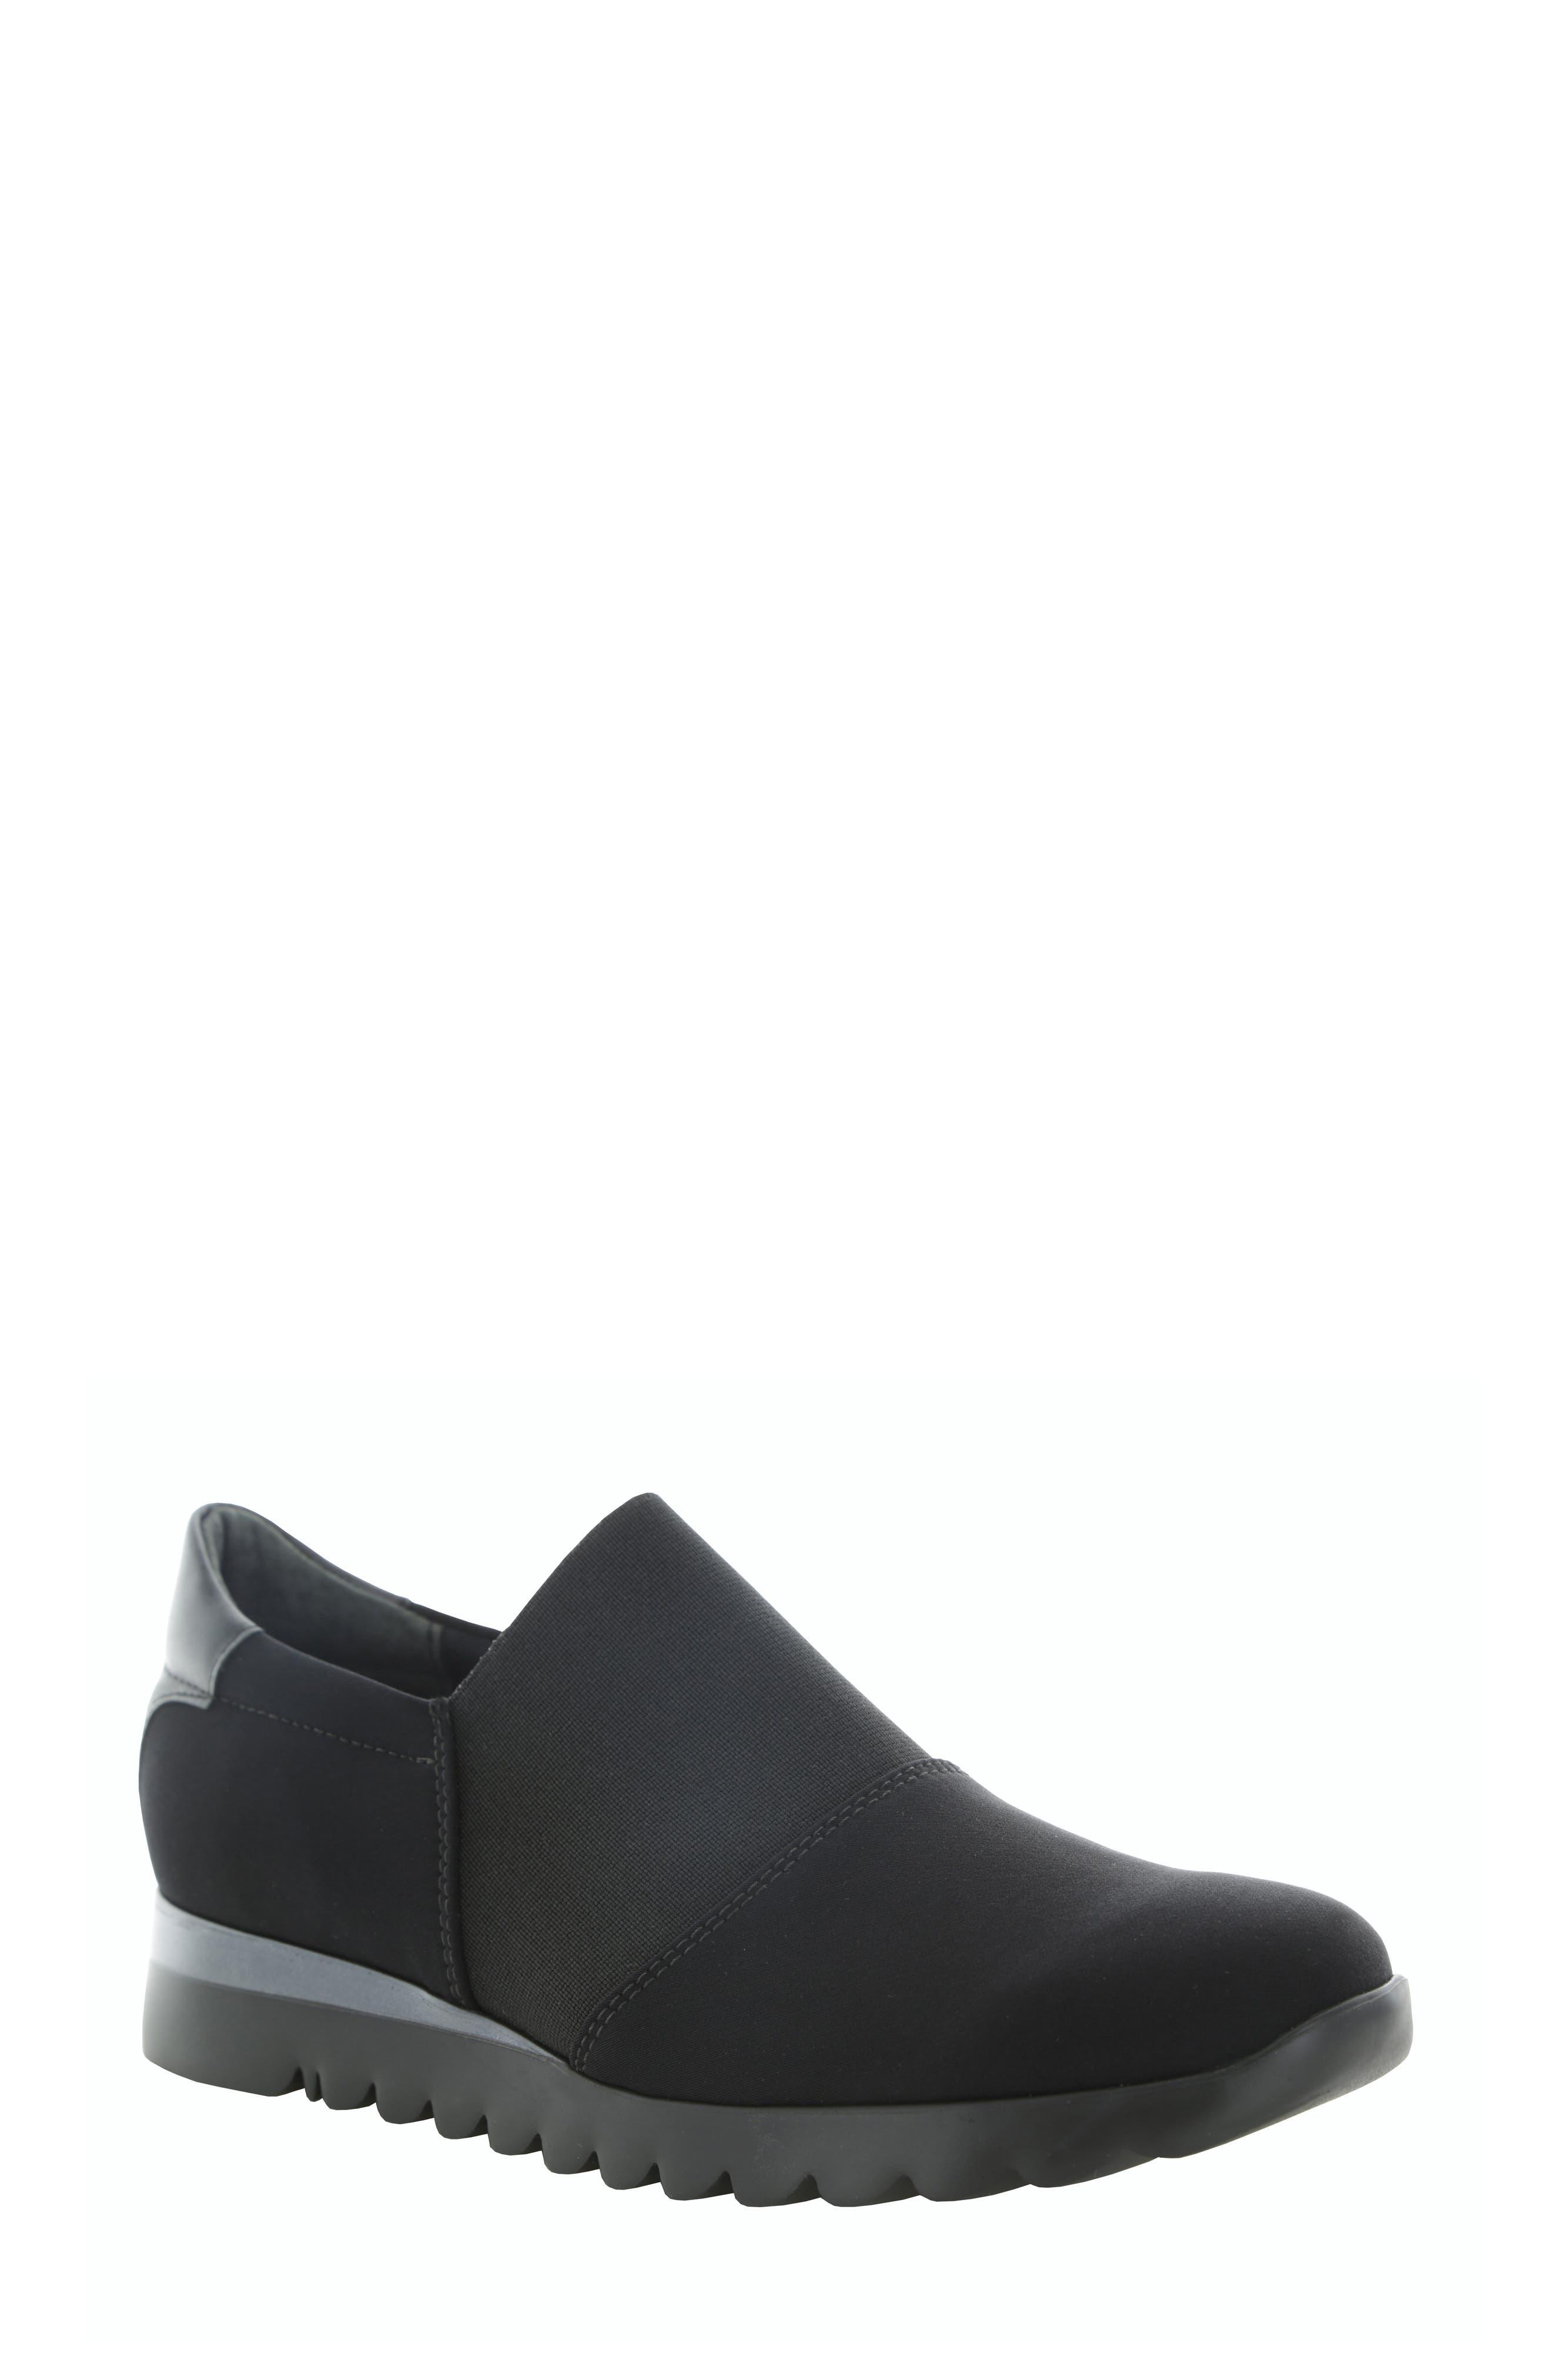 Munro Kj Slip-On Sneaker- Black